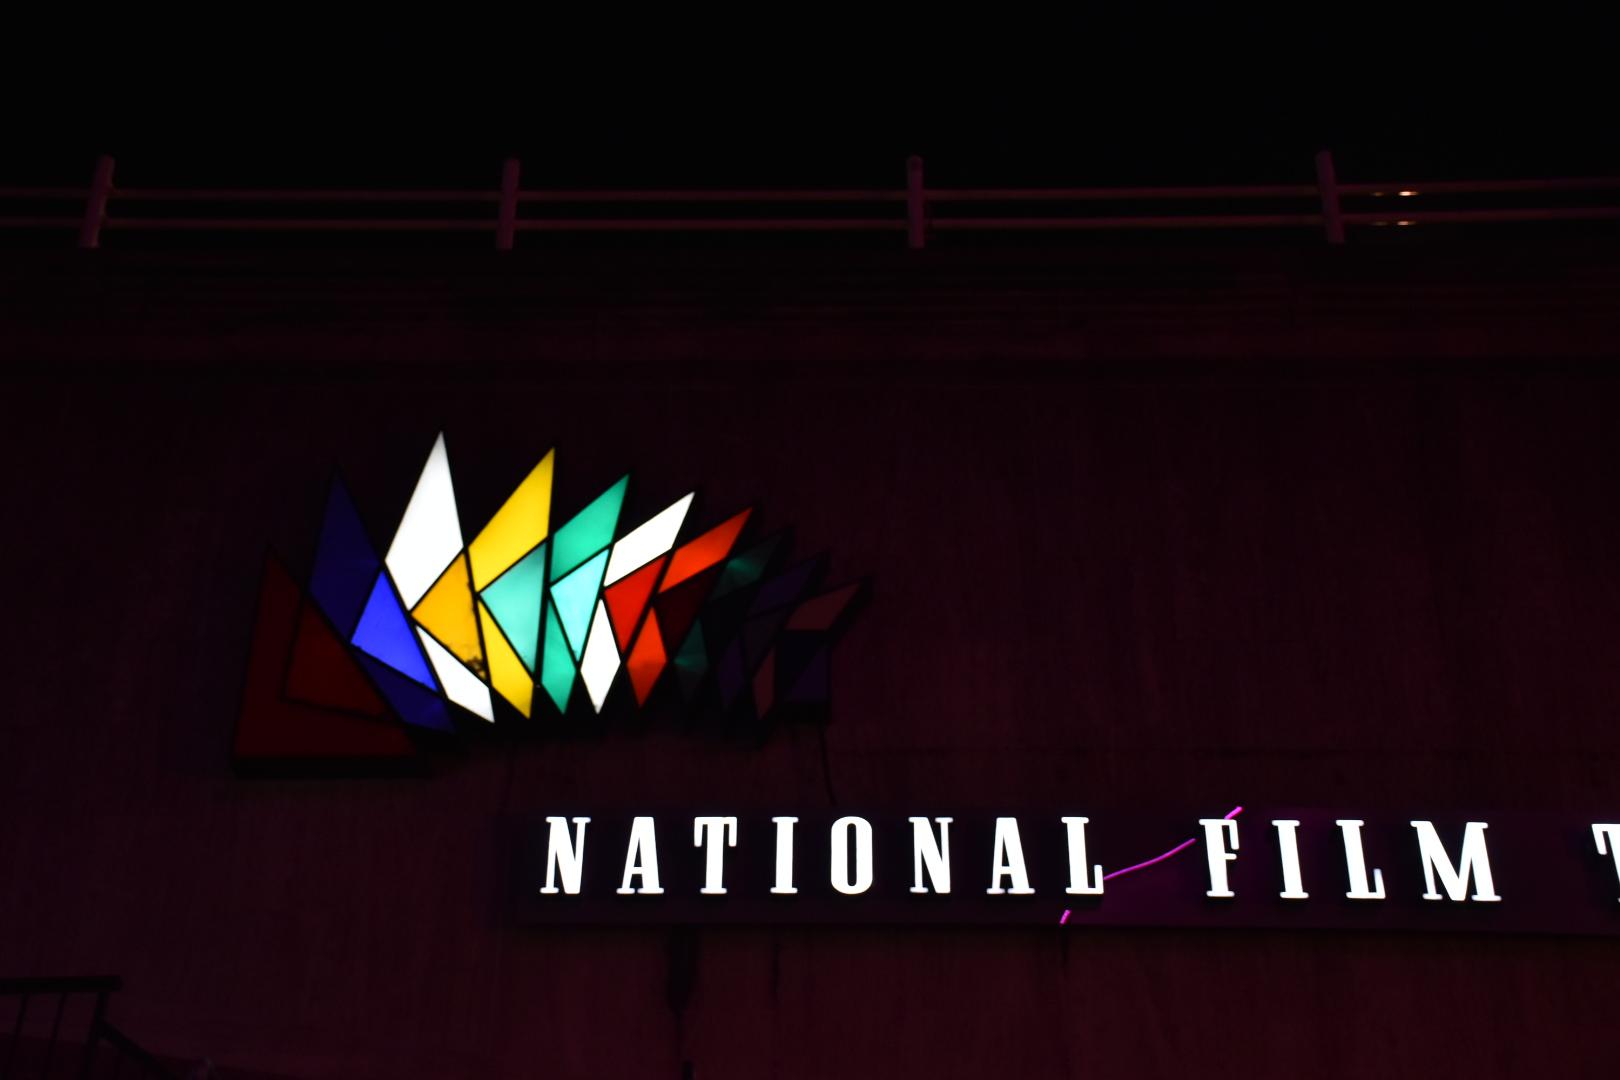 National Film Theatre Sign Lambeth